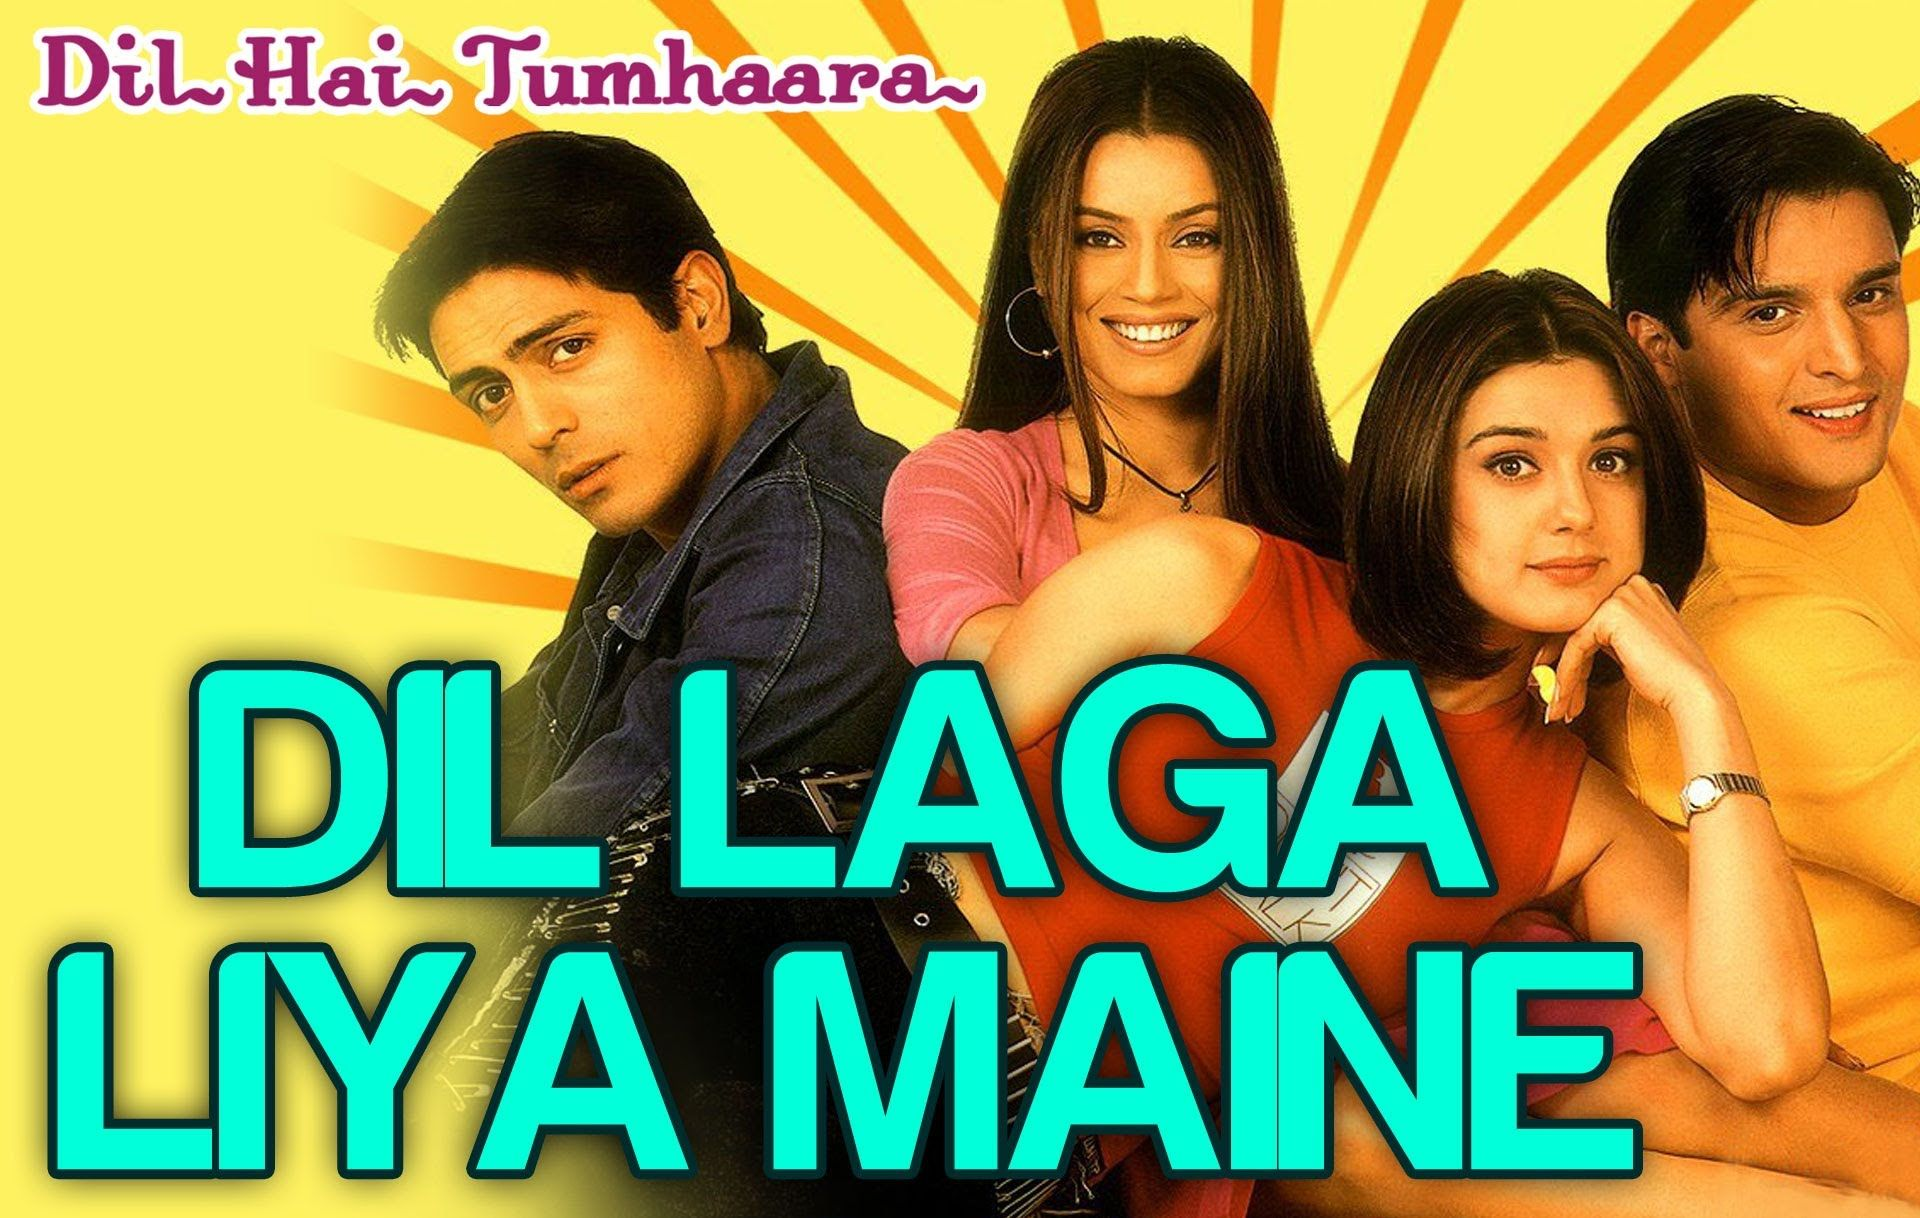 Dil Laga Liya Maine Dil Hai Tumhaara Preity Arjun Rampal Alka Ya Omg Romantic Songs Latest Bollywood Songs Bollywood Music